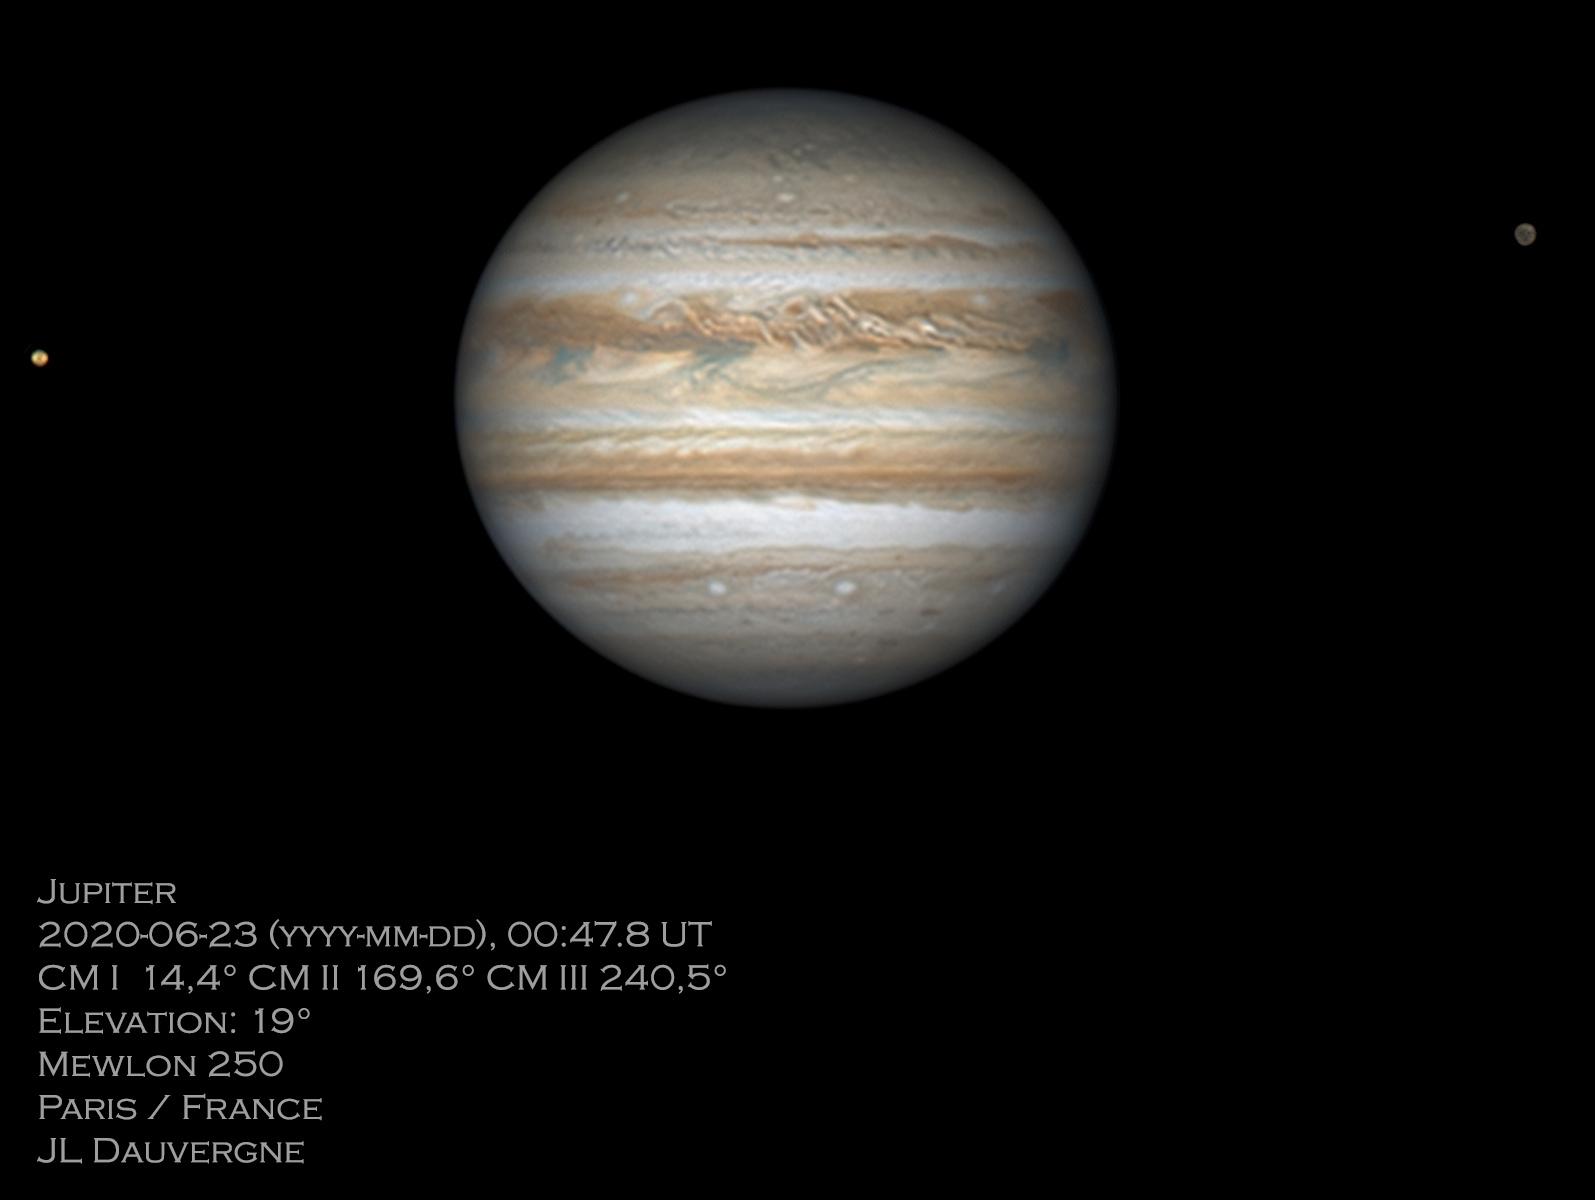 5ef452584aa04_2020-06-23-0047_8-L2-Jupiter_ZWOASI290MMMini_lapl5_ap274AST.jpg.1ff06964f5e984920710e00d61a04eaf.jpg